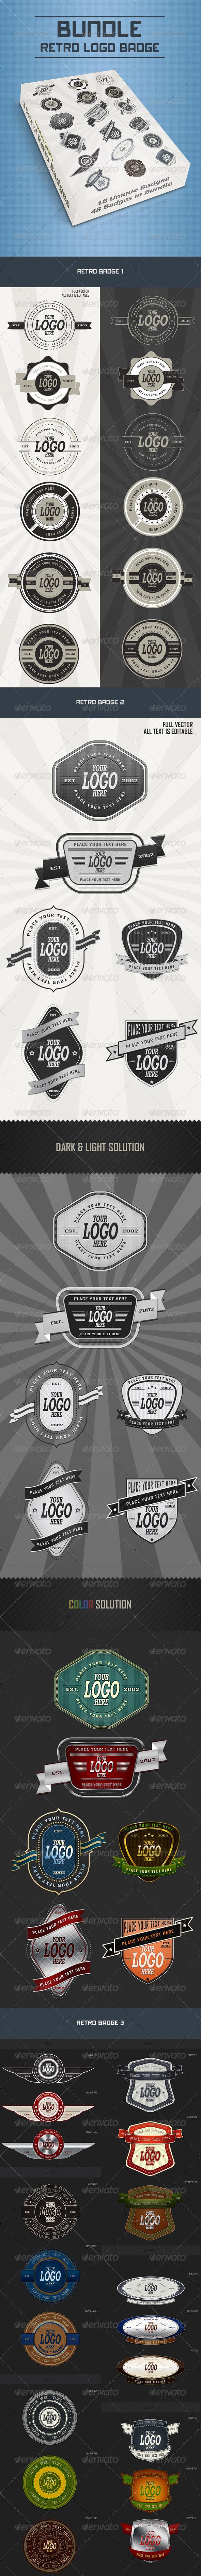 Bundle Retro Badge - Badges & Stickers Web Elements